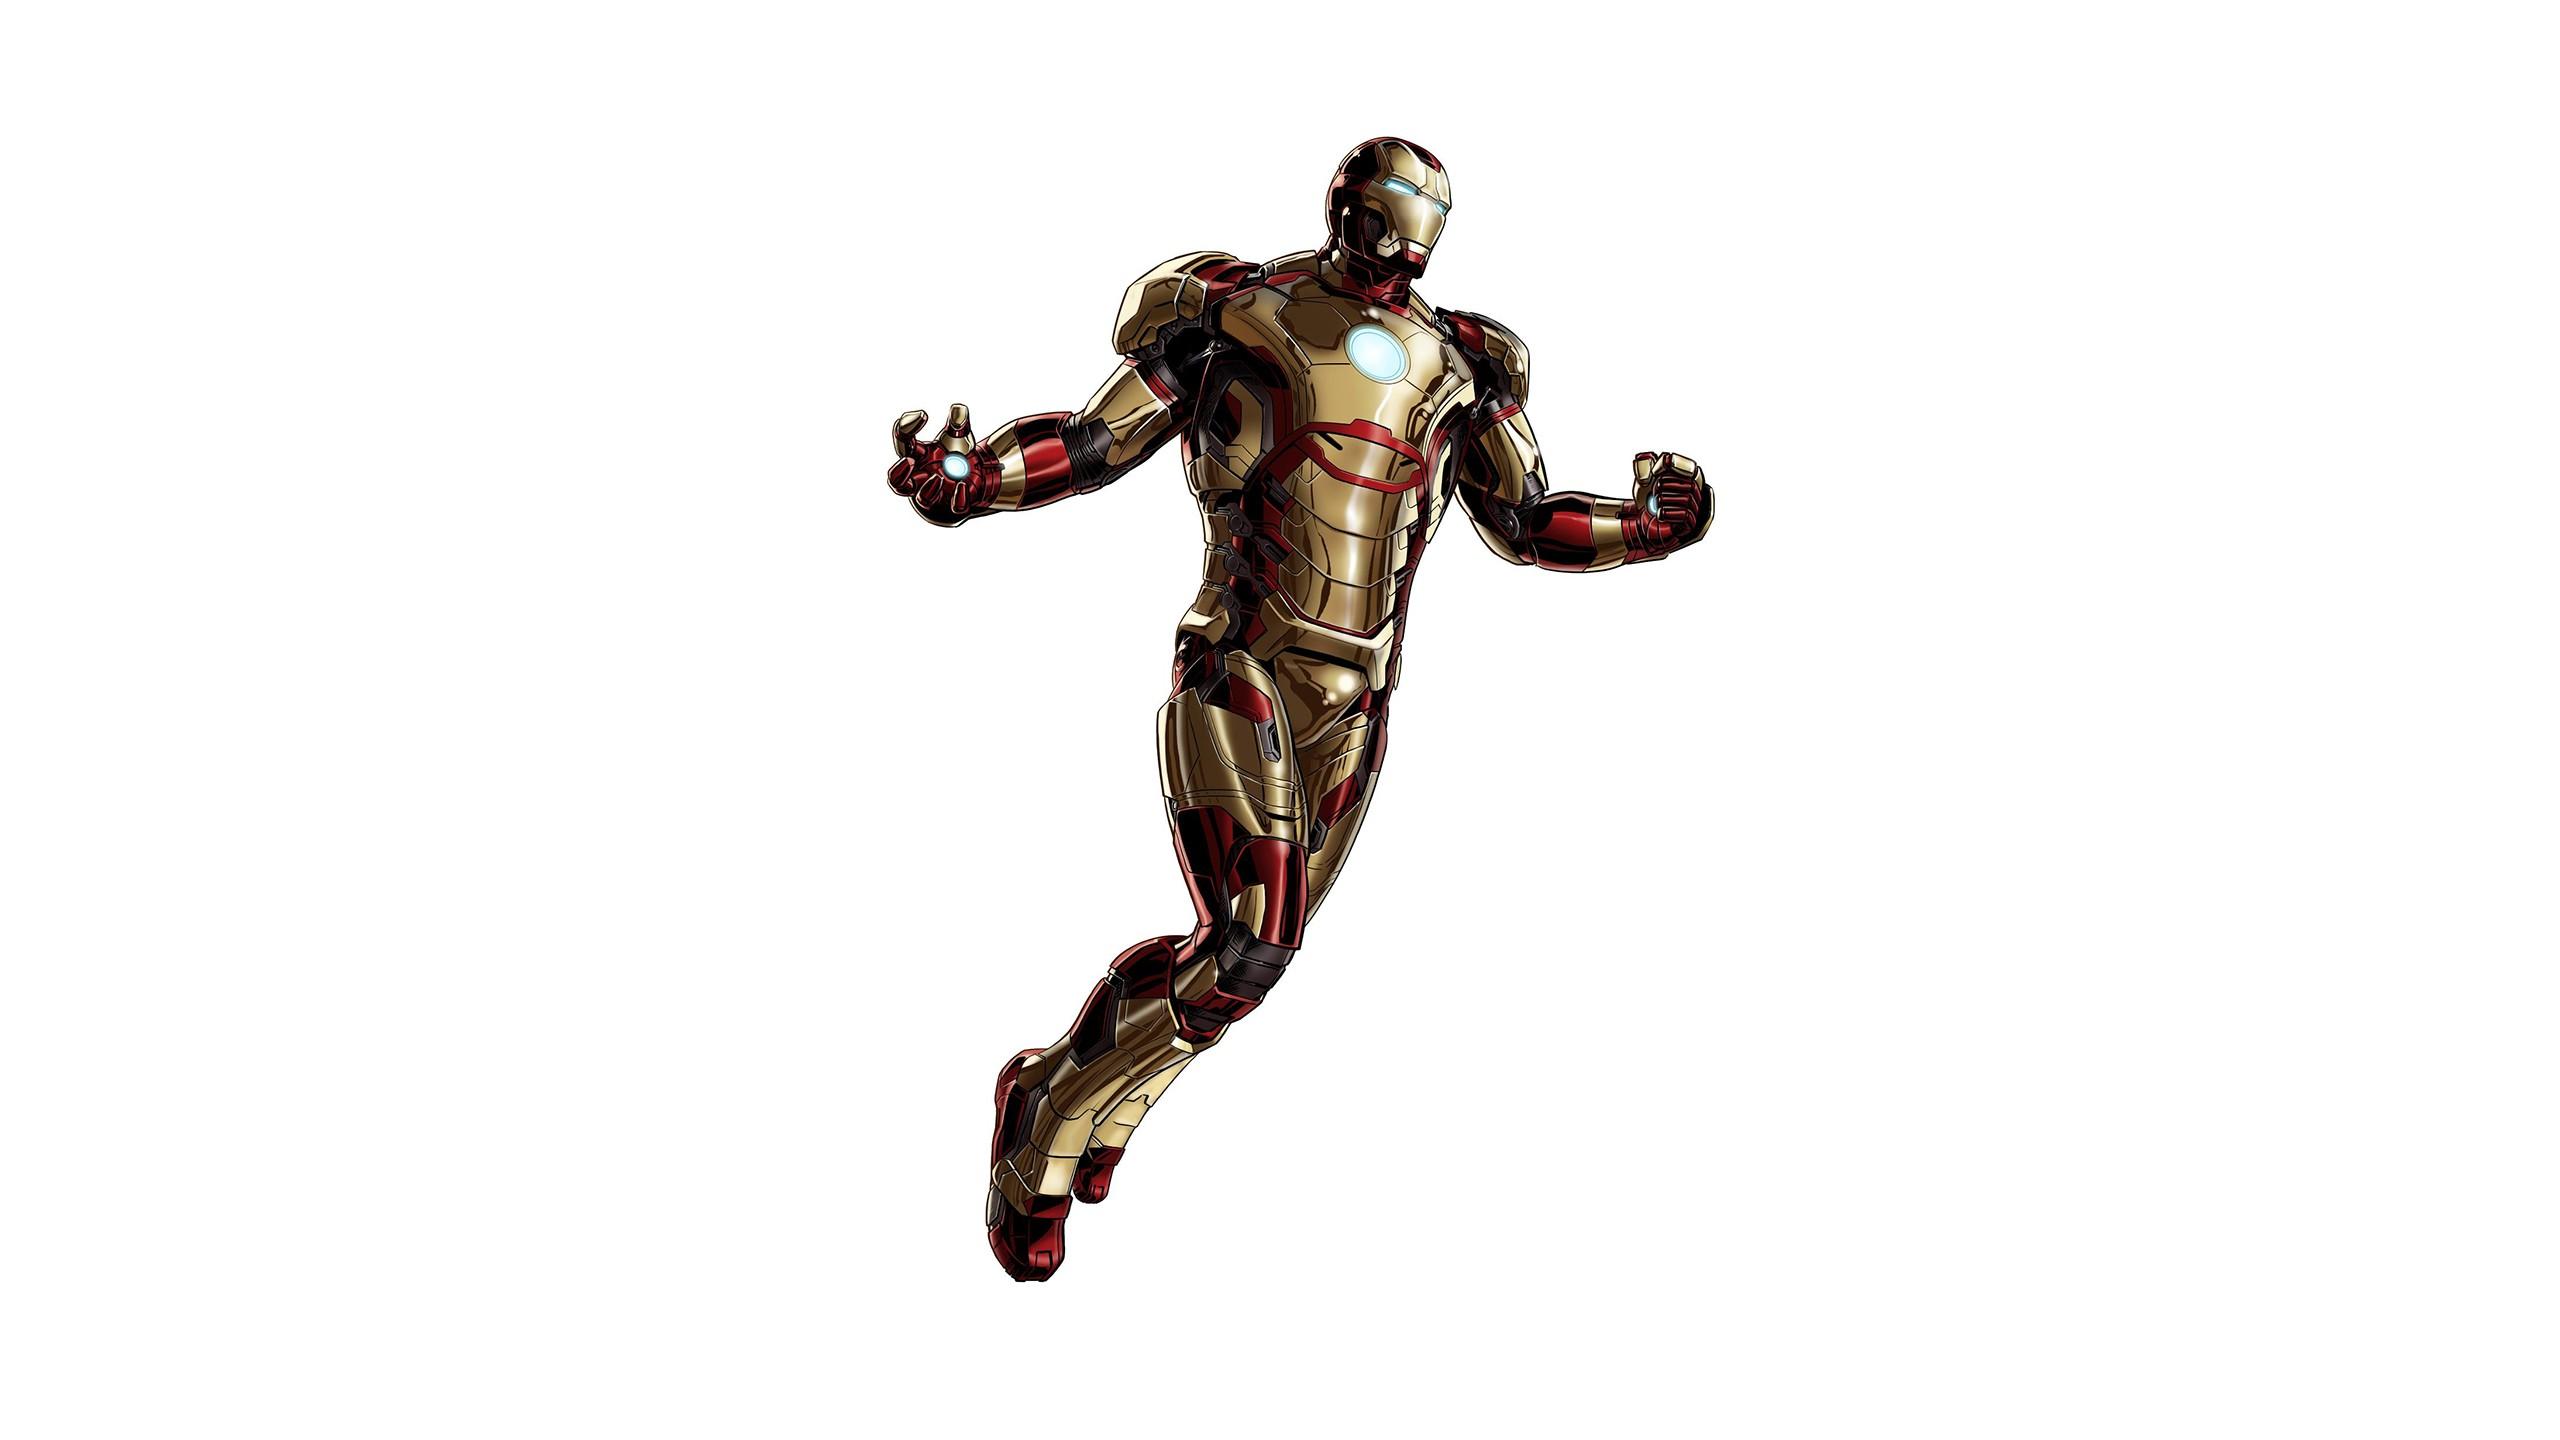 Iron Man 3d Wallpaper Download Iron Man White Comics Movies Superhero Wallpaper